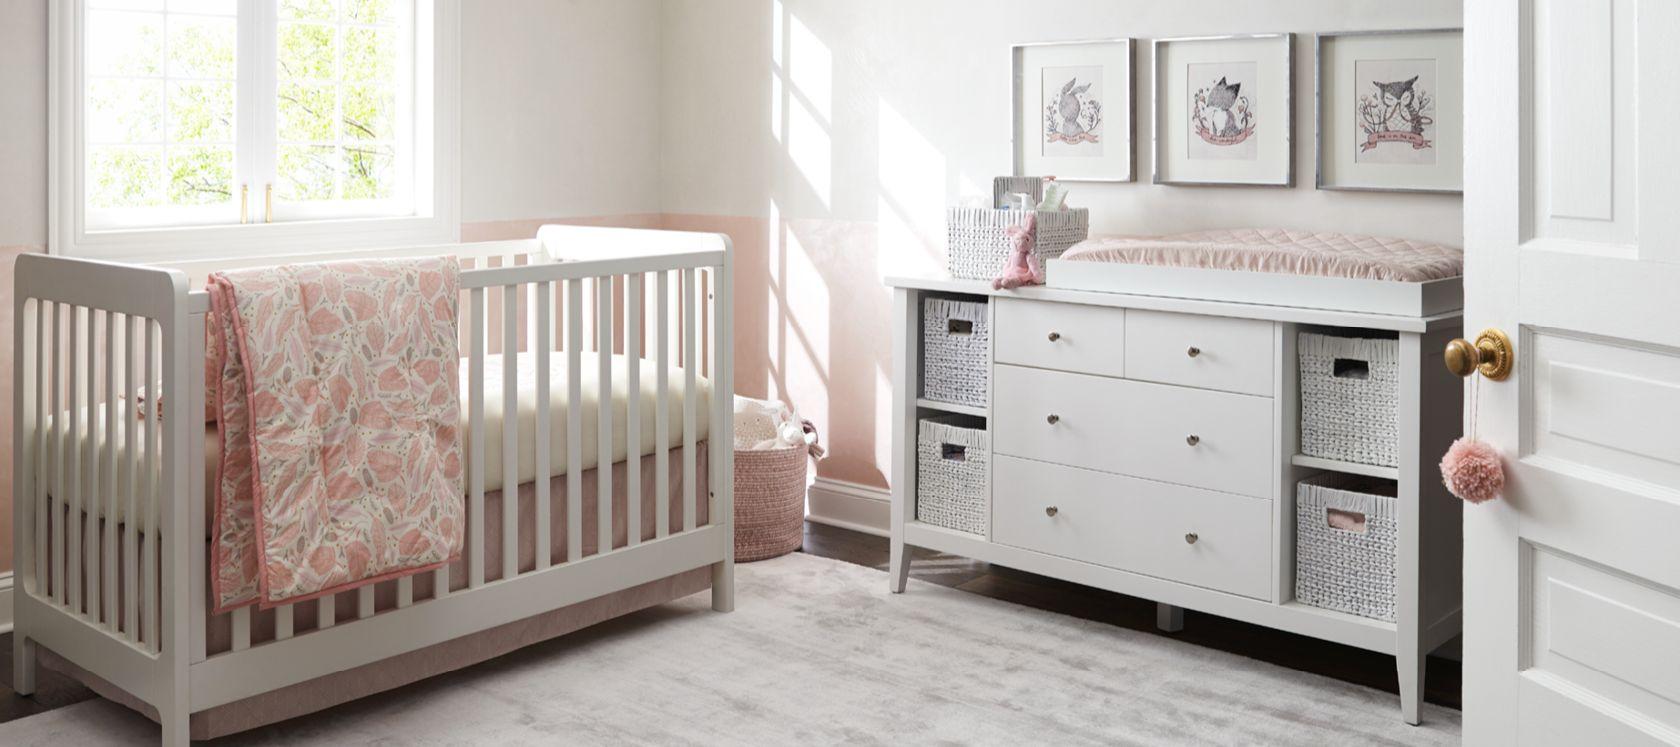 Crib Bench Decor